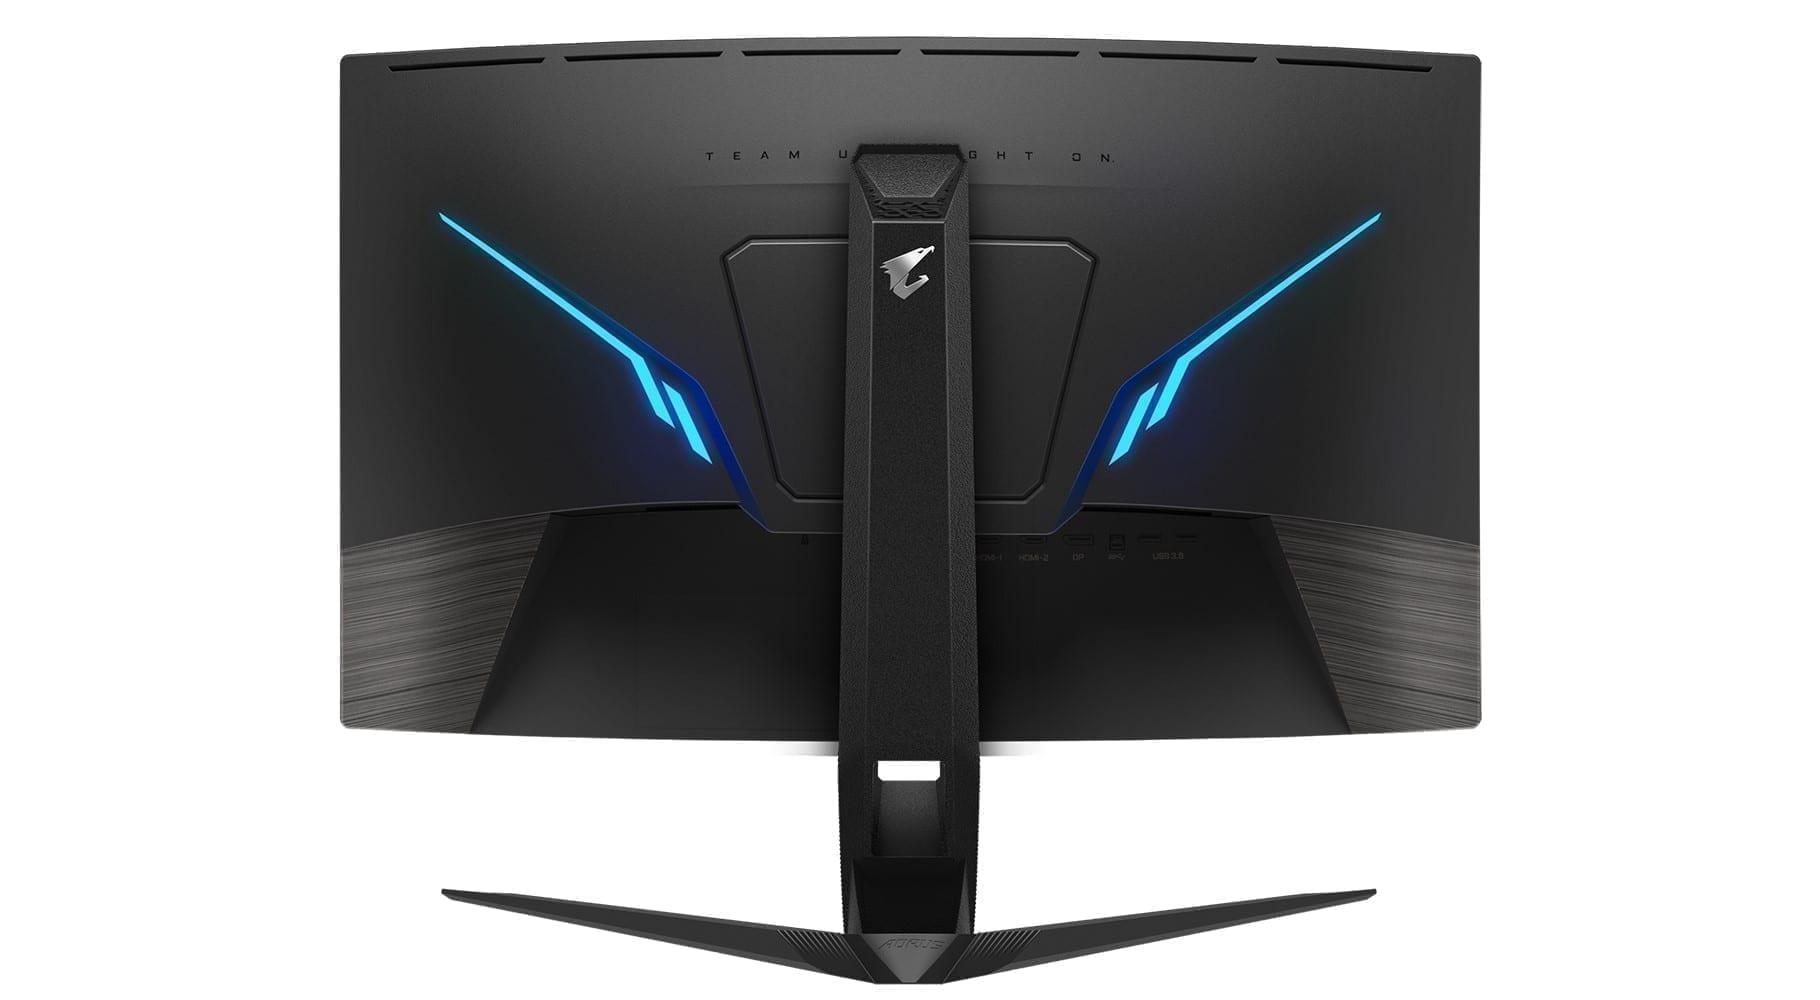 AORUS CV27Q Gaming Monitor 2k - 165Hz - 1ms 5